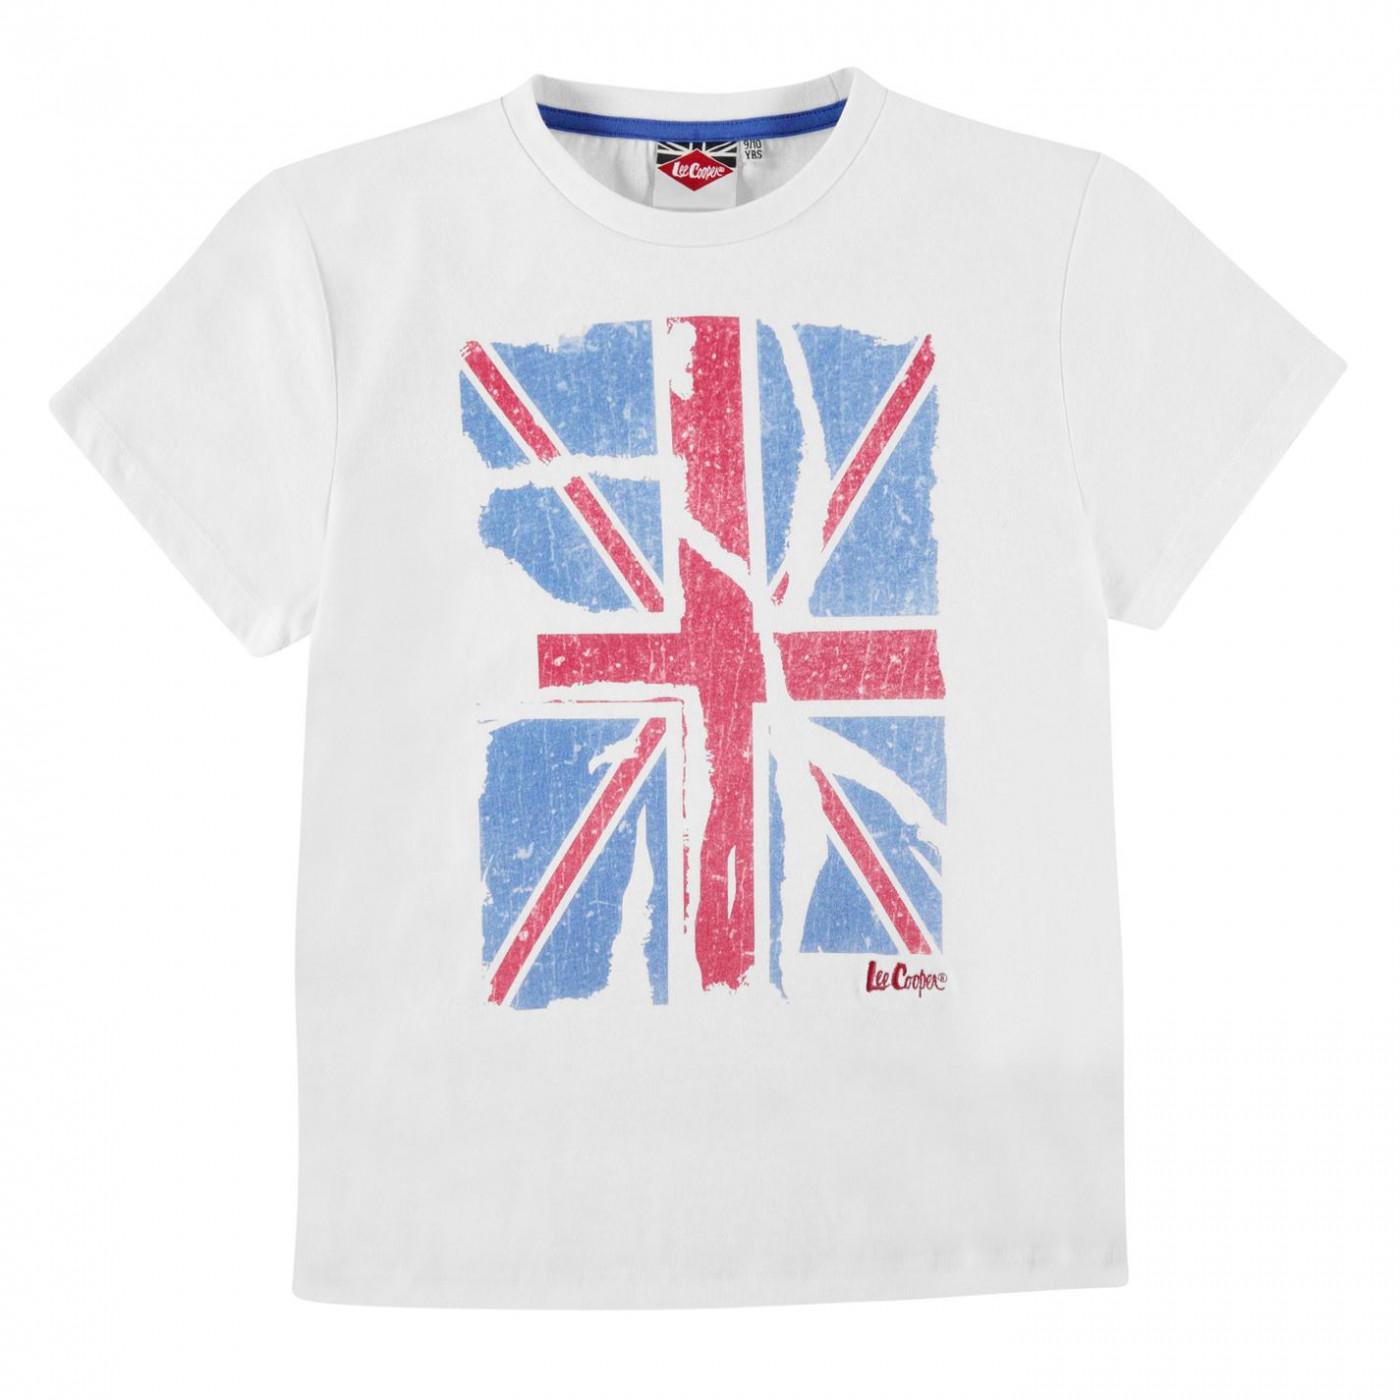 8cf4bc574 Lee Cooper LDN Graphic T Shirt Junior Boys - FACTCOOL